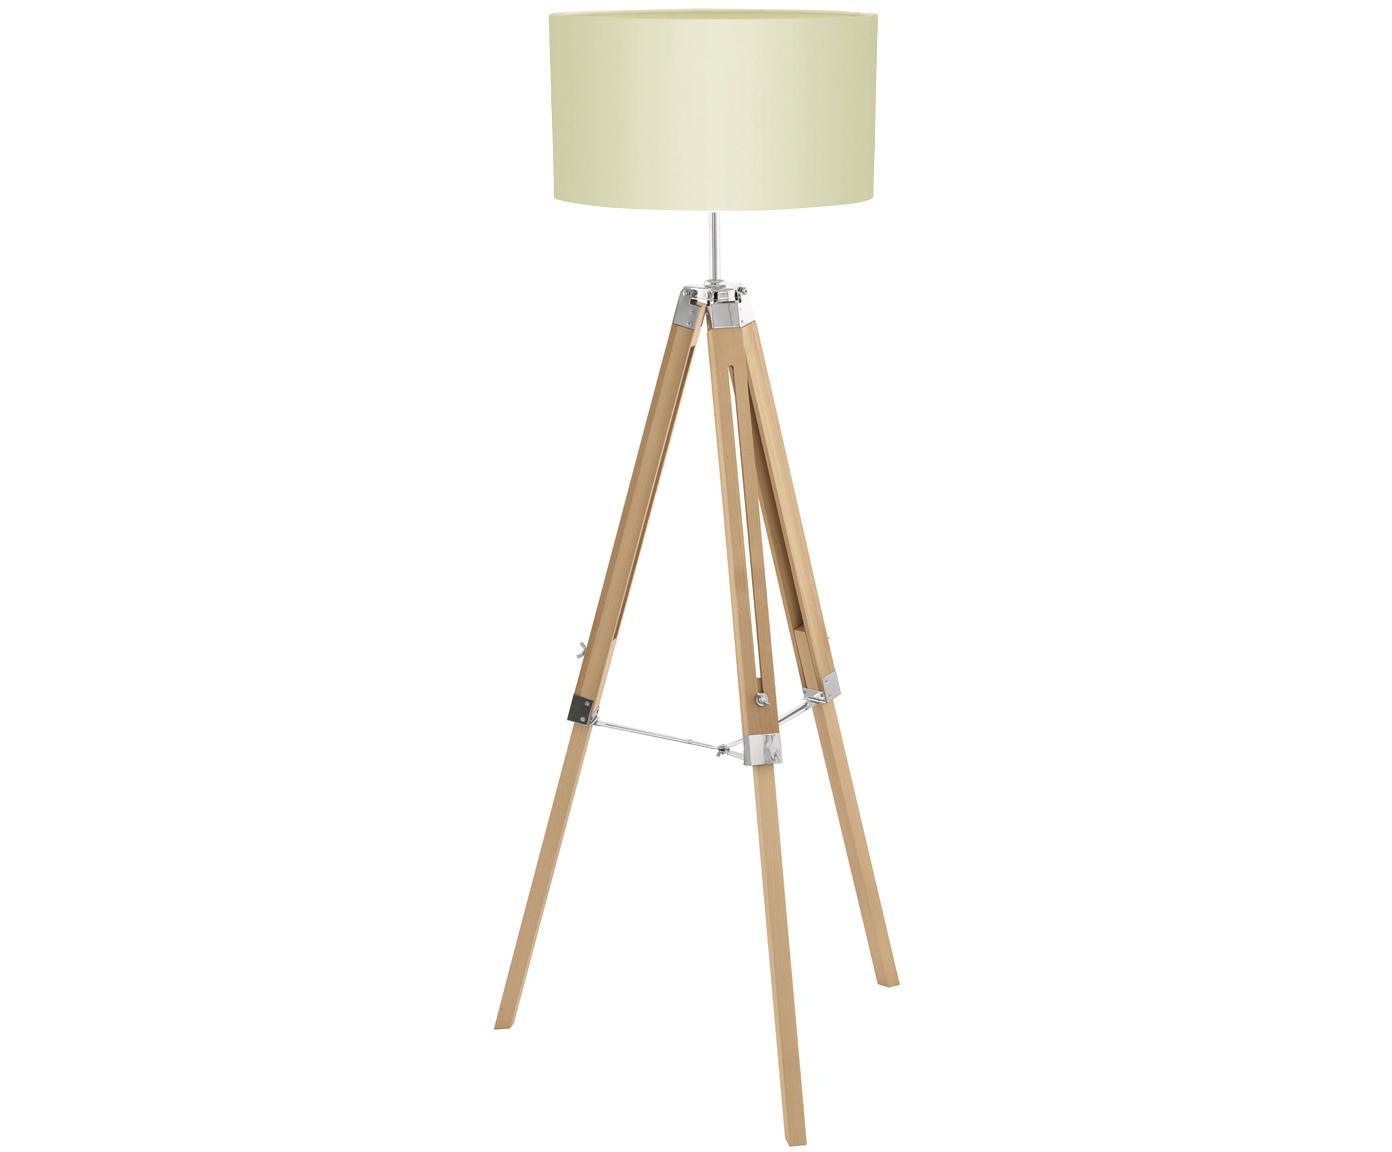 Stehlampe Lantada Aus Holz Hohenverstellbar Westwingnow